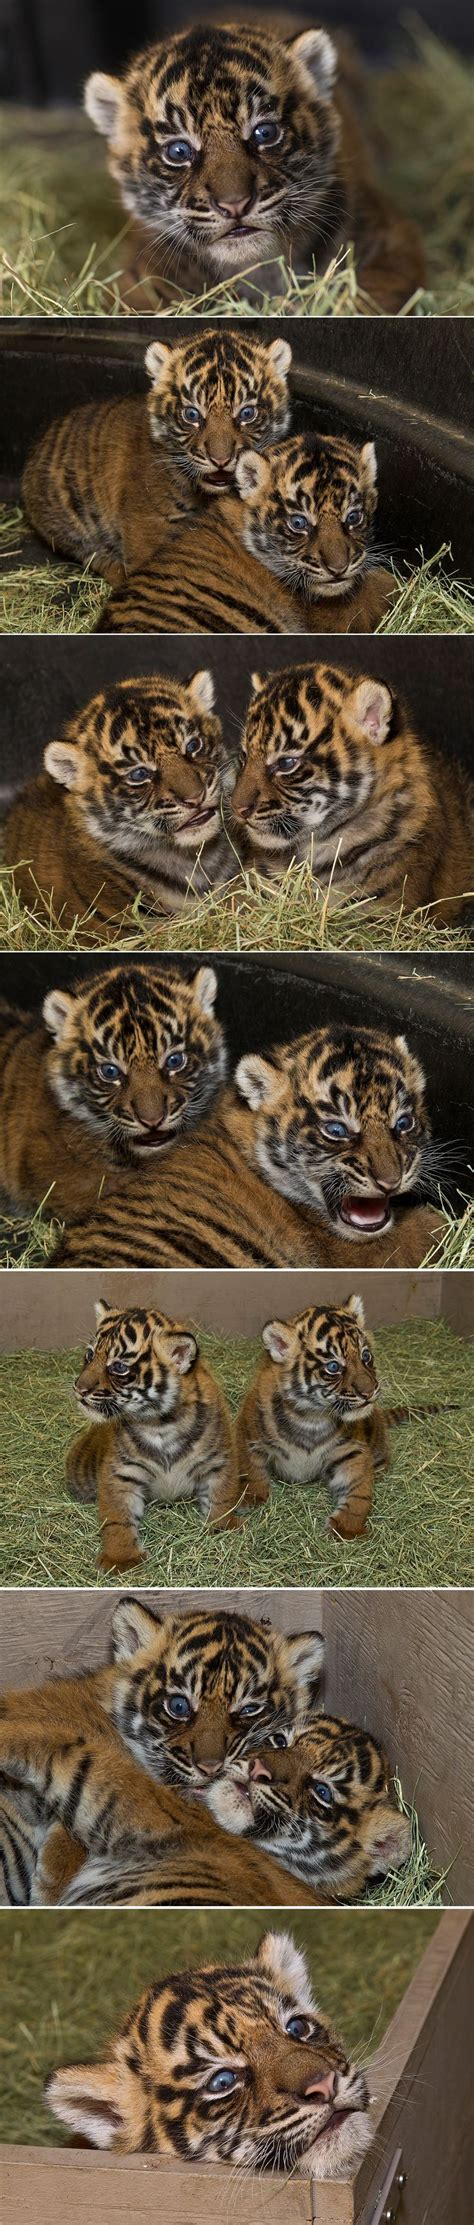 San Diego Tiger Trail Animals Beautiful